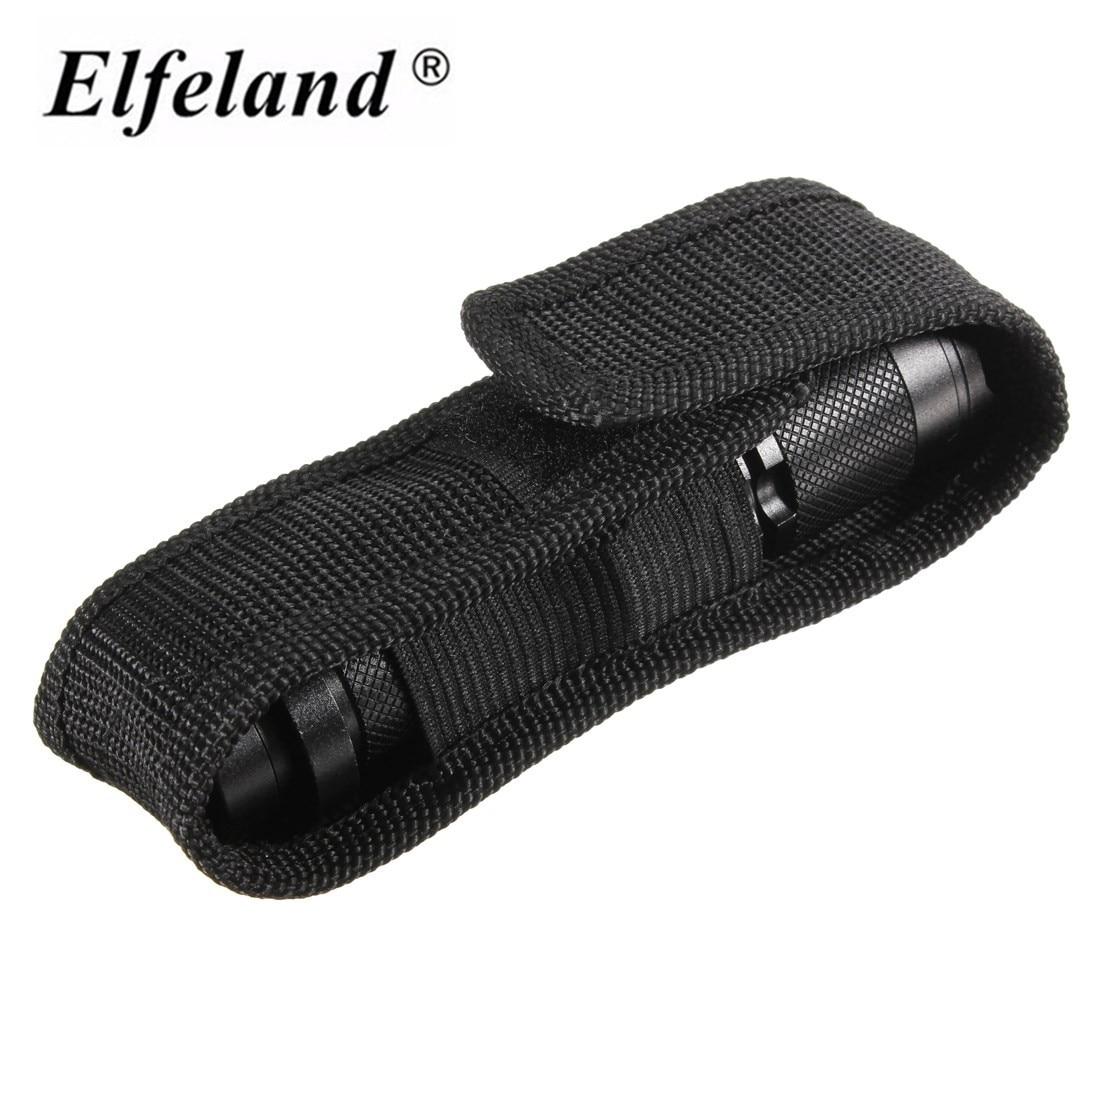 13cm Black Nylon Holster Holder Case Cover Belt High quality Pouch for LED Torch Flashlight for most 18650 flashlight